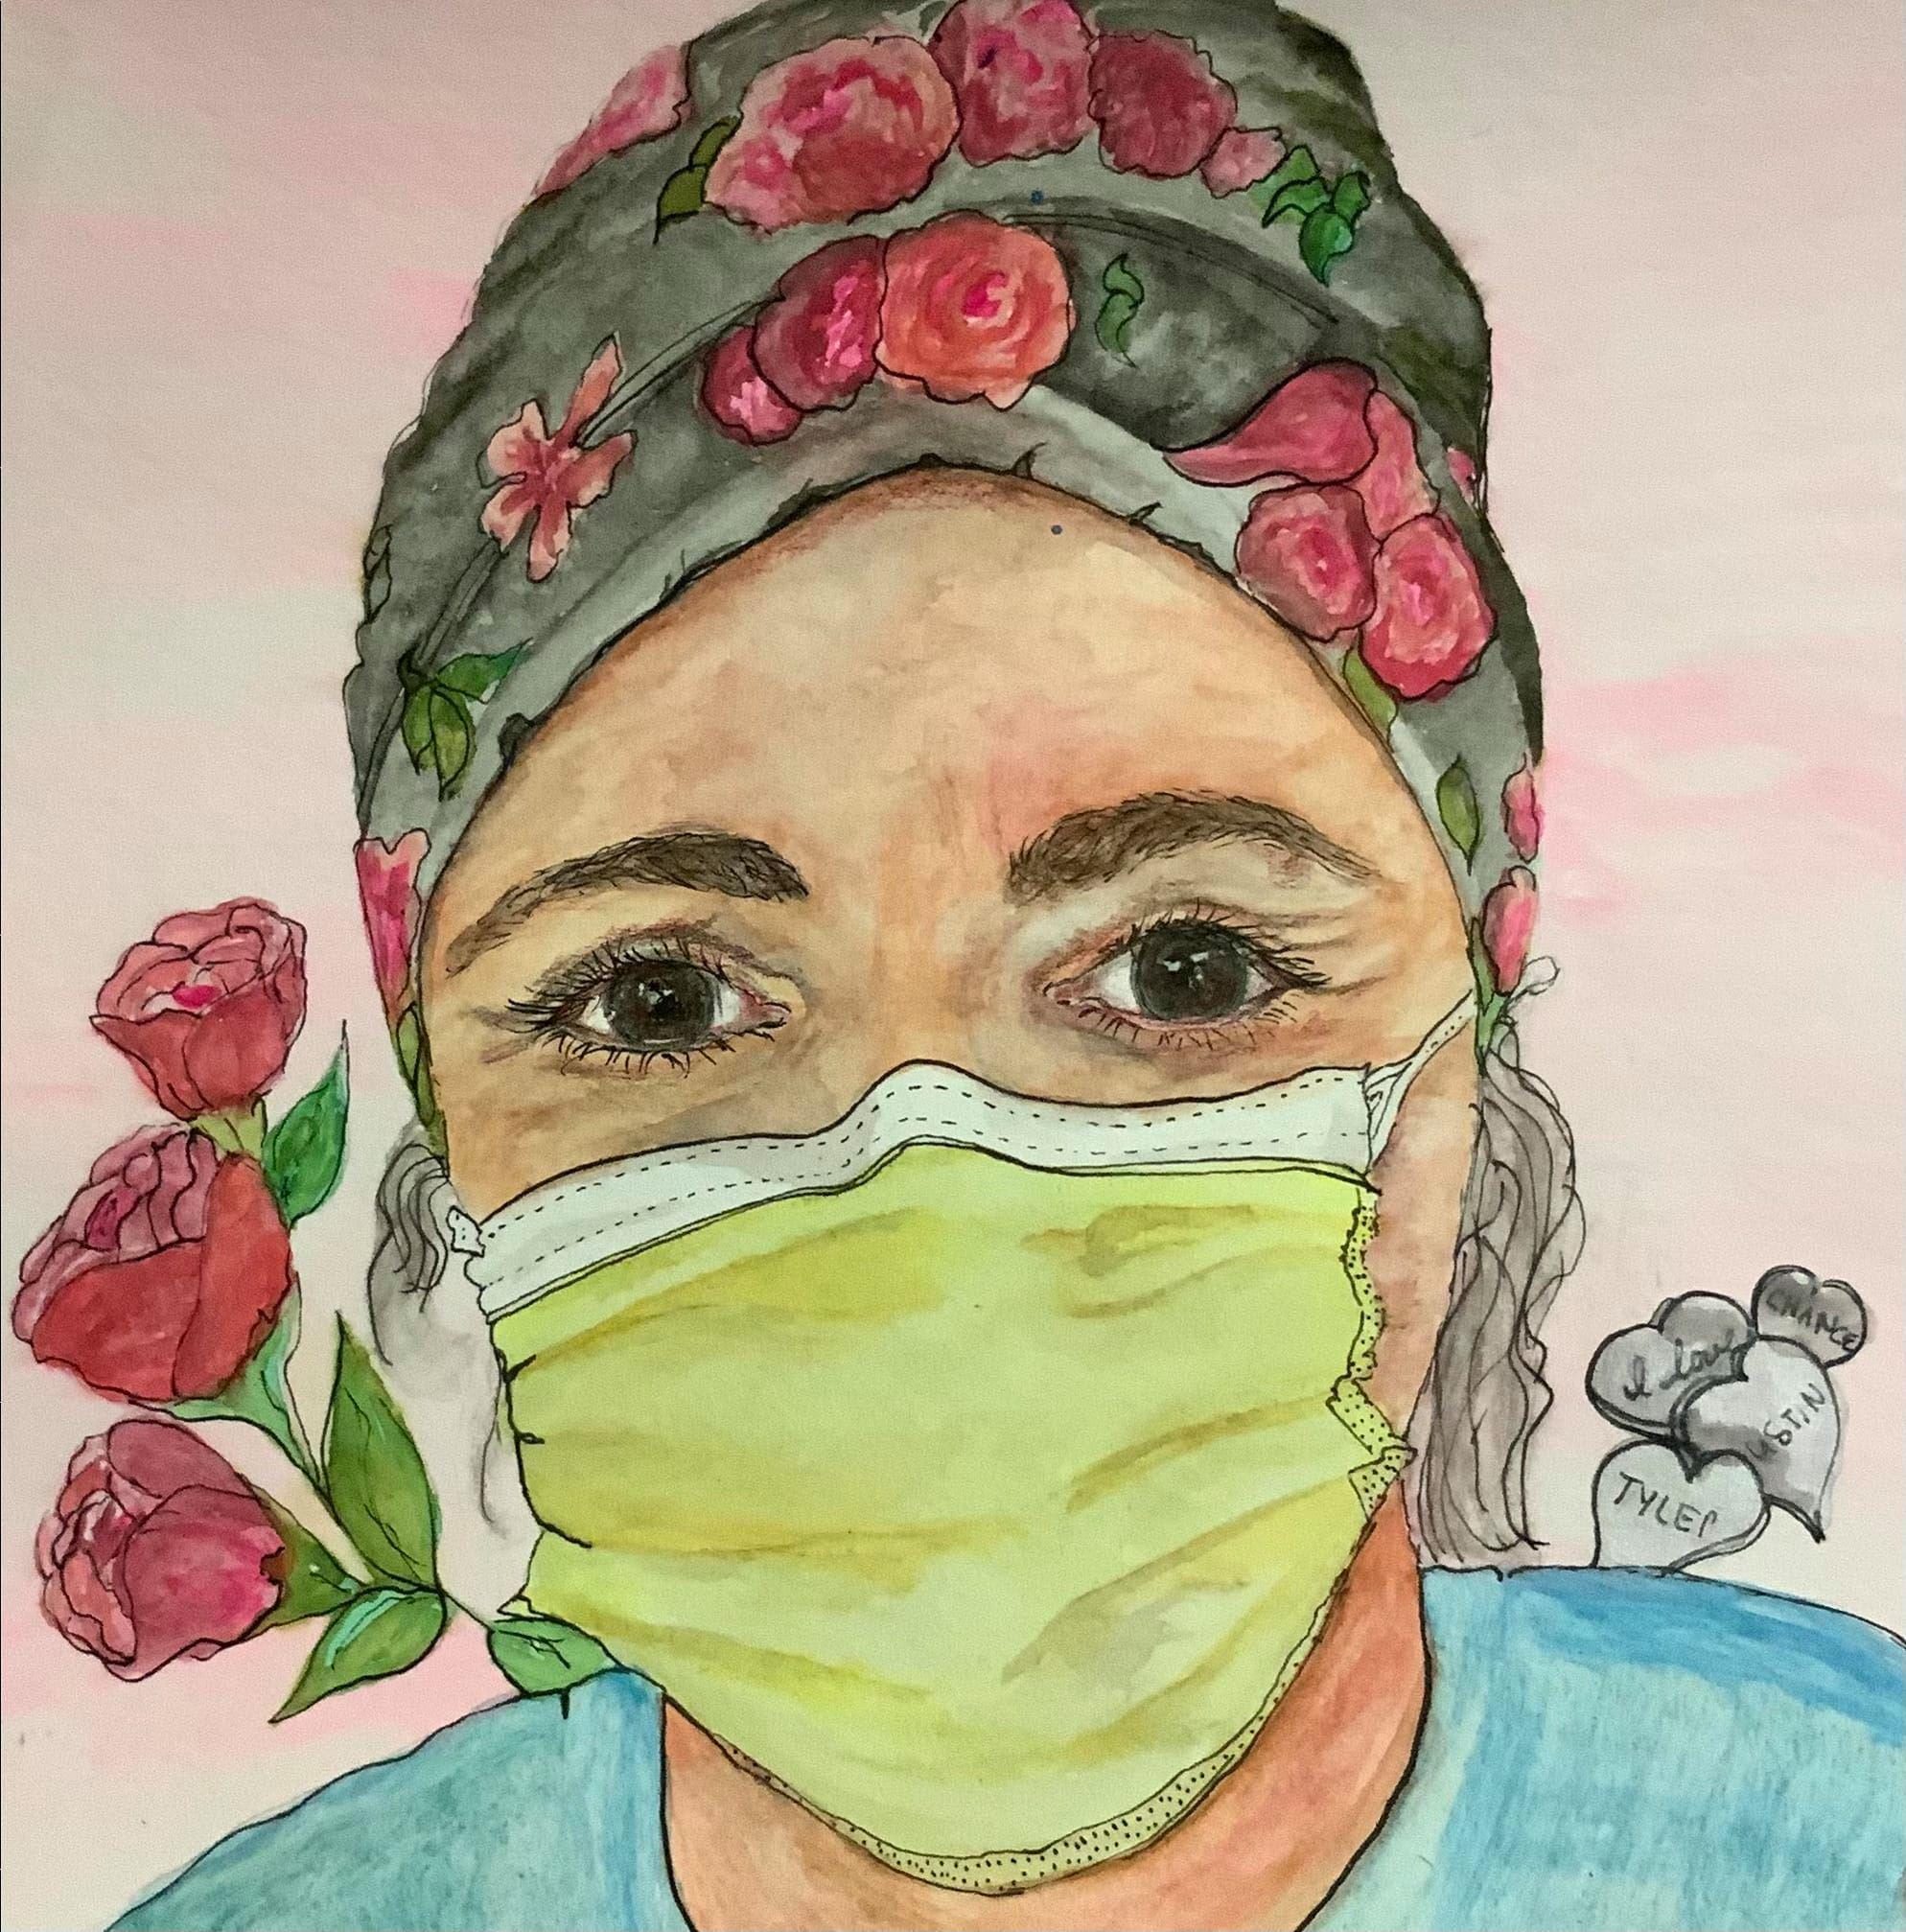 Karie Portrait for Healthcare Heroes